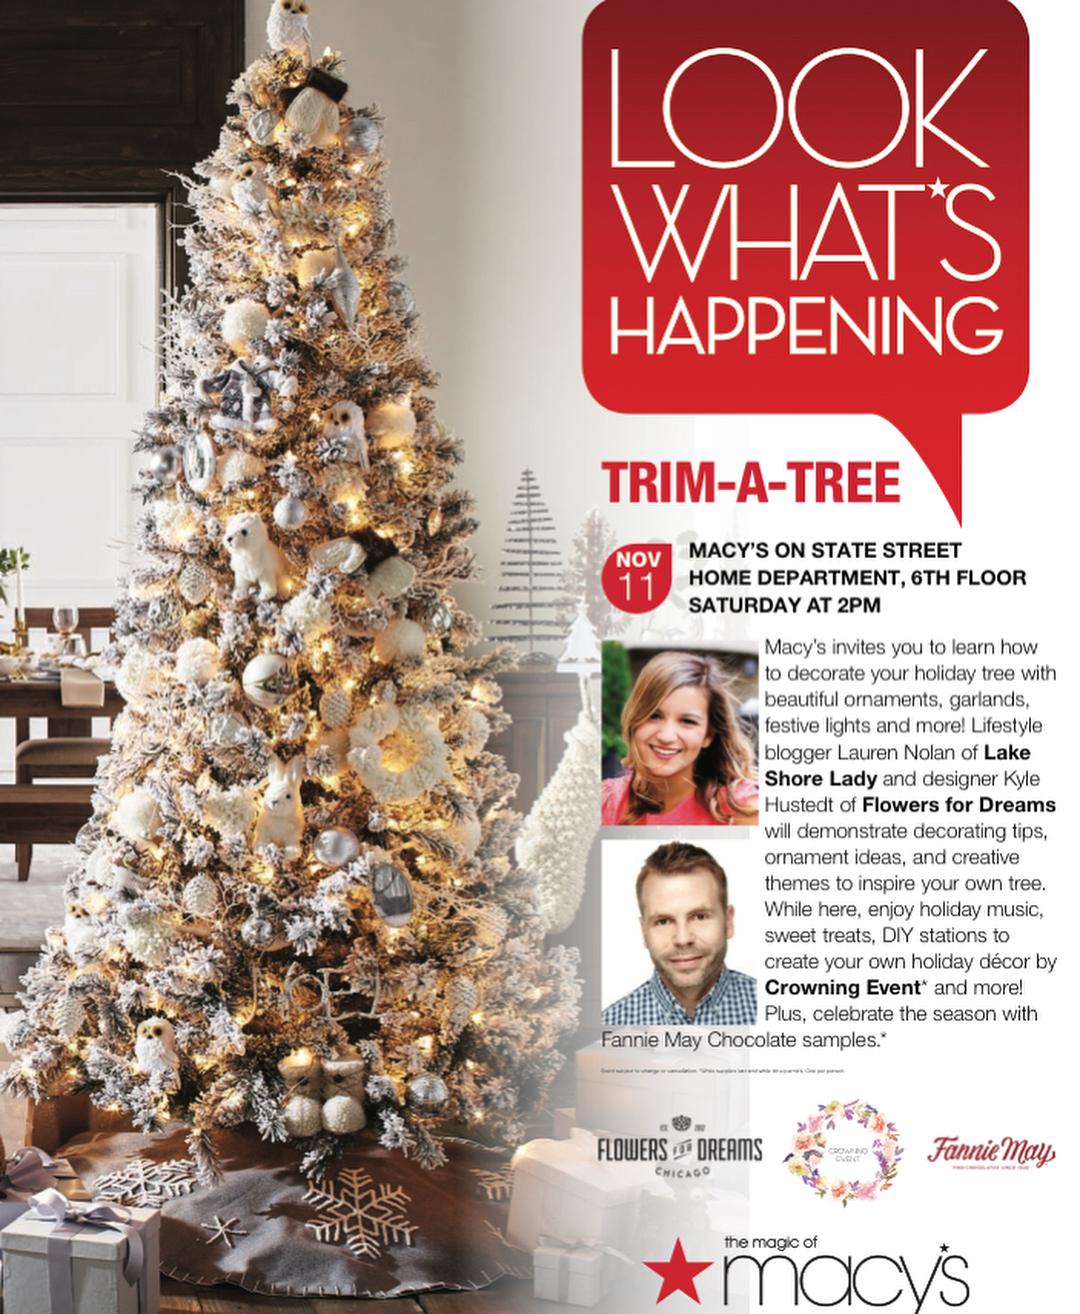 Trim a Tree Macy's Event